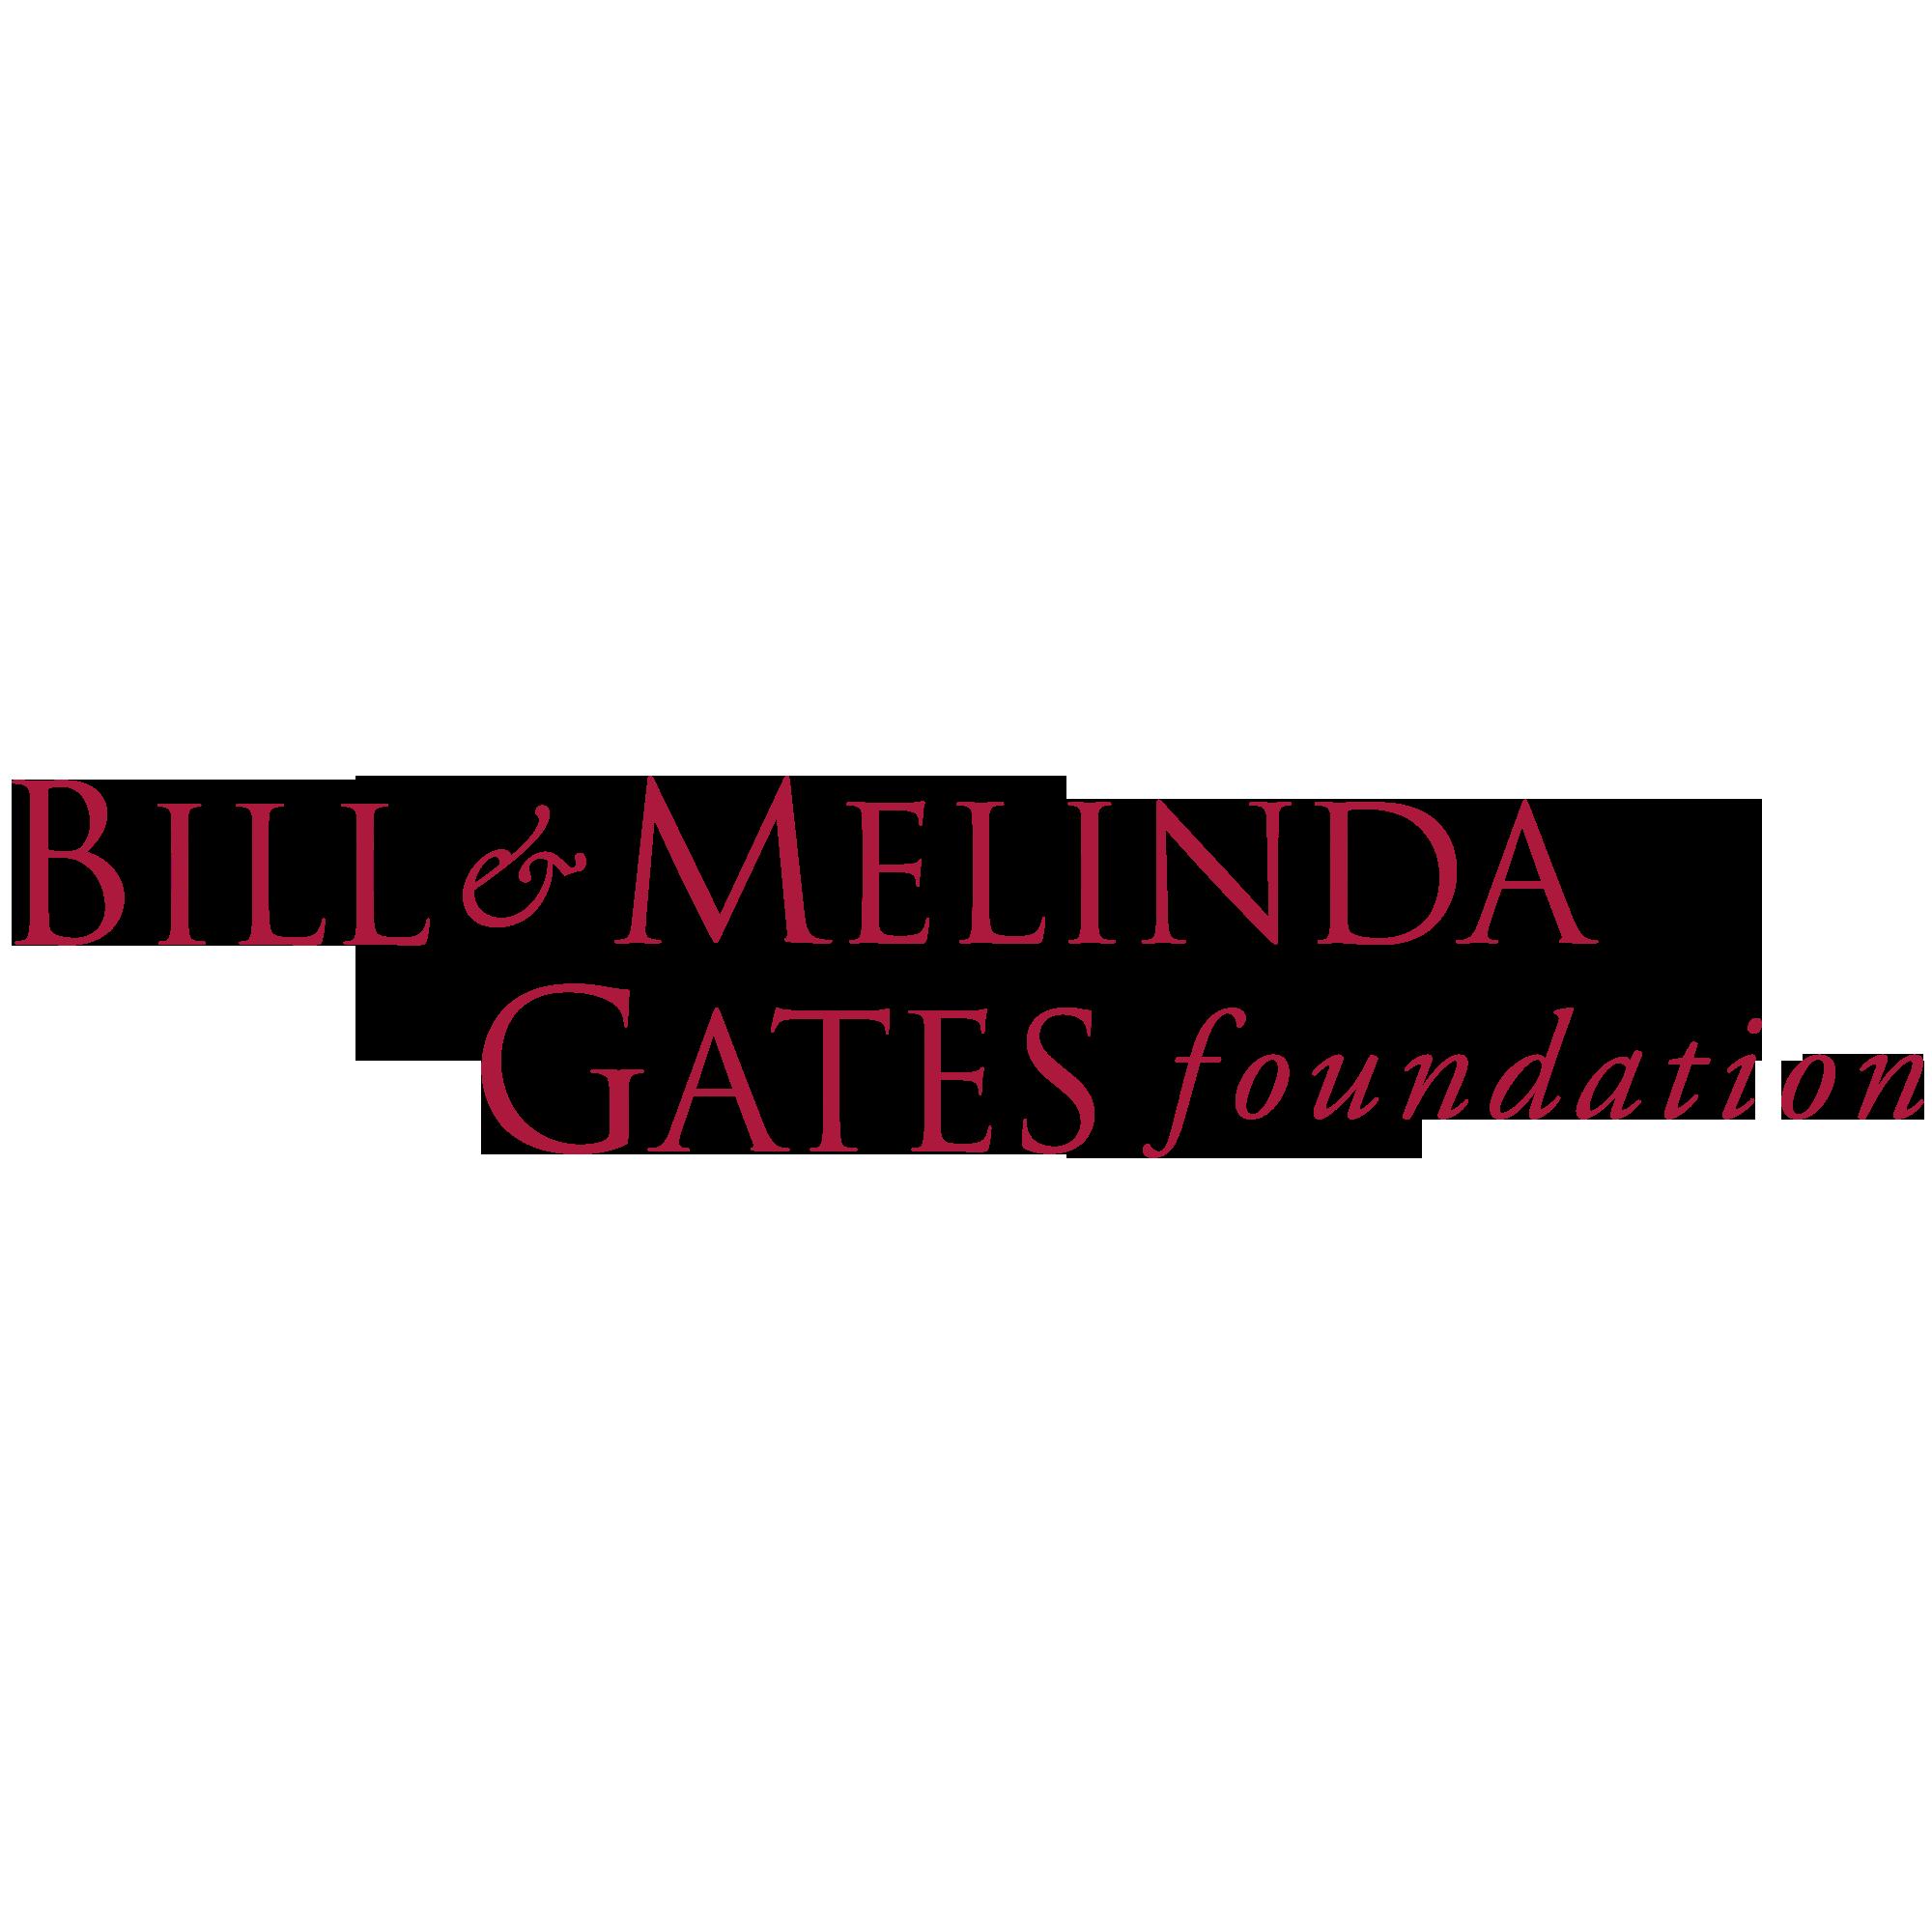 Bill-Melinda-Gates-Foundation-Logo-copy_square.png